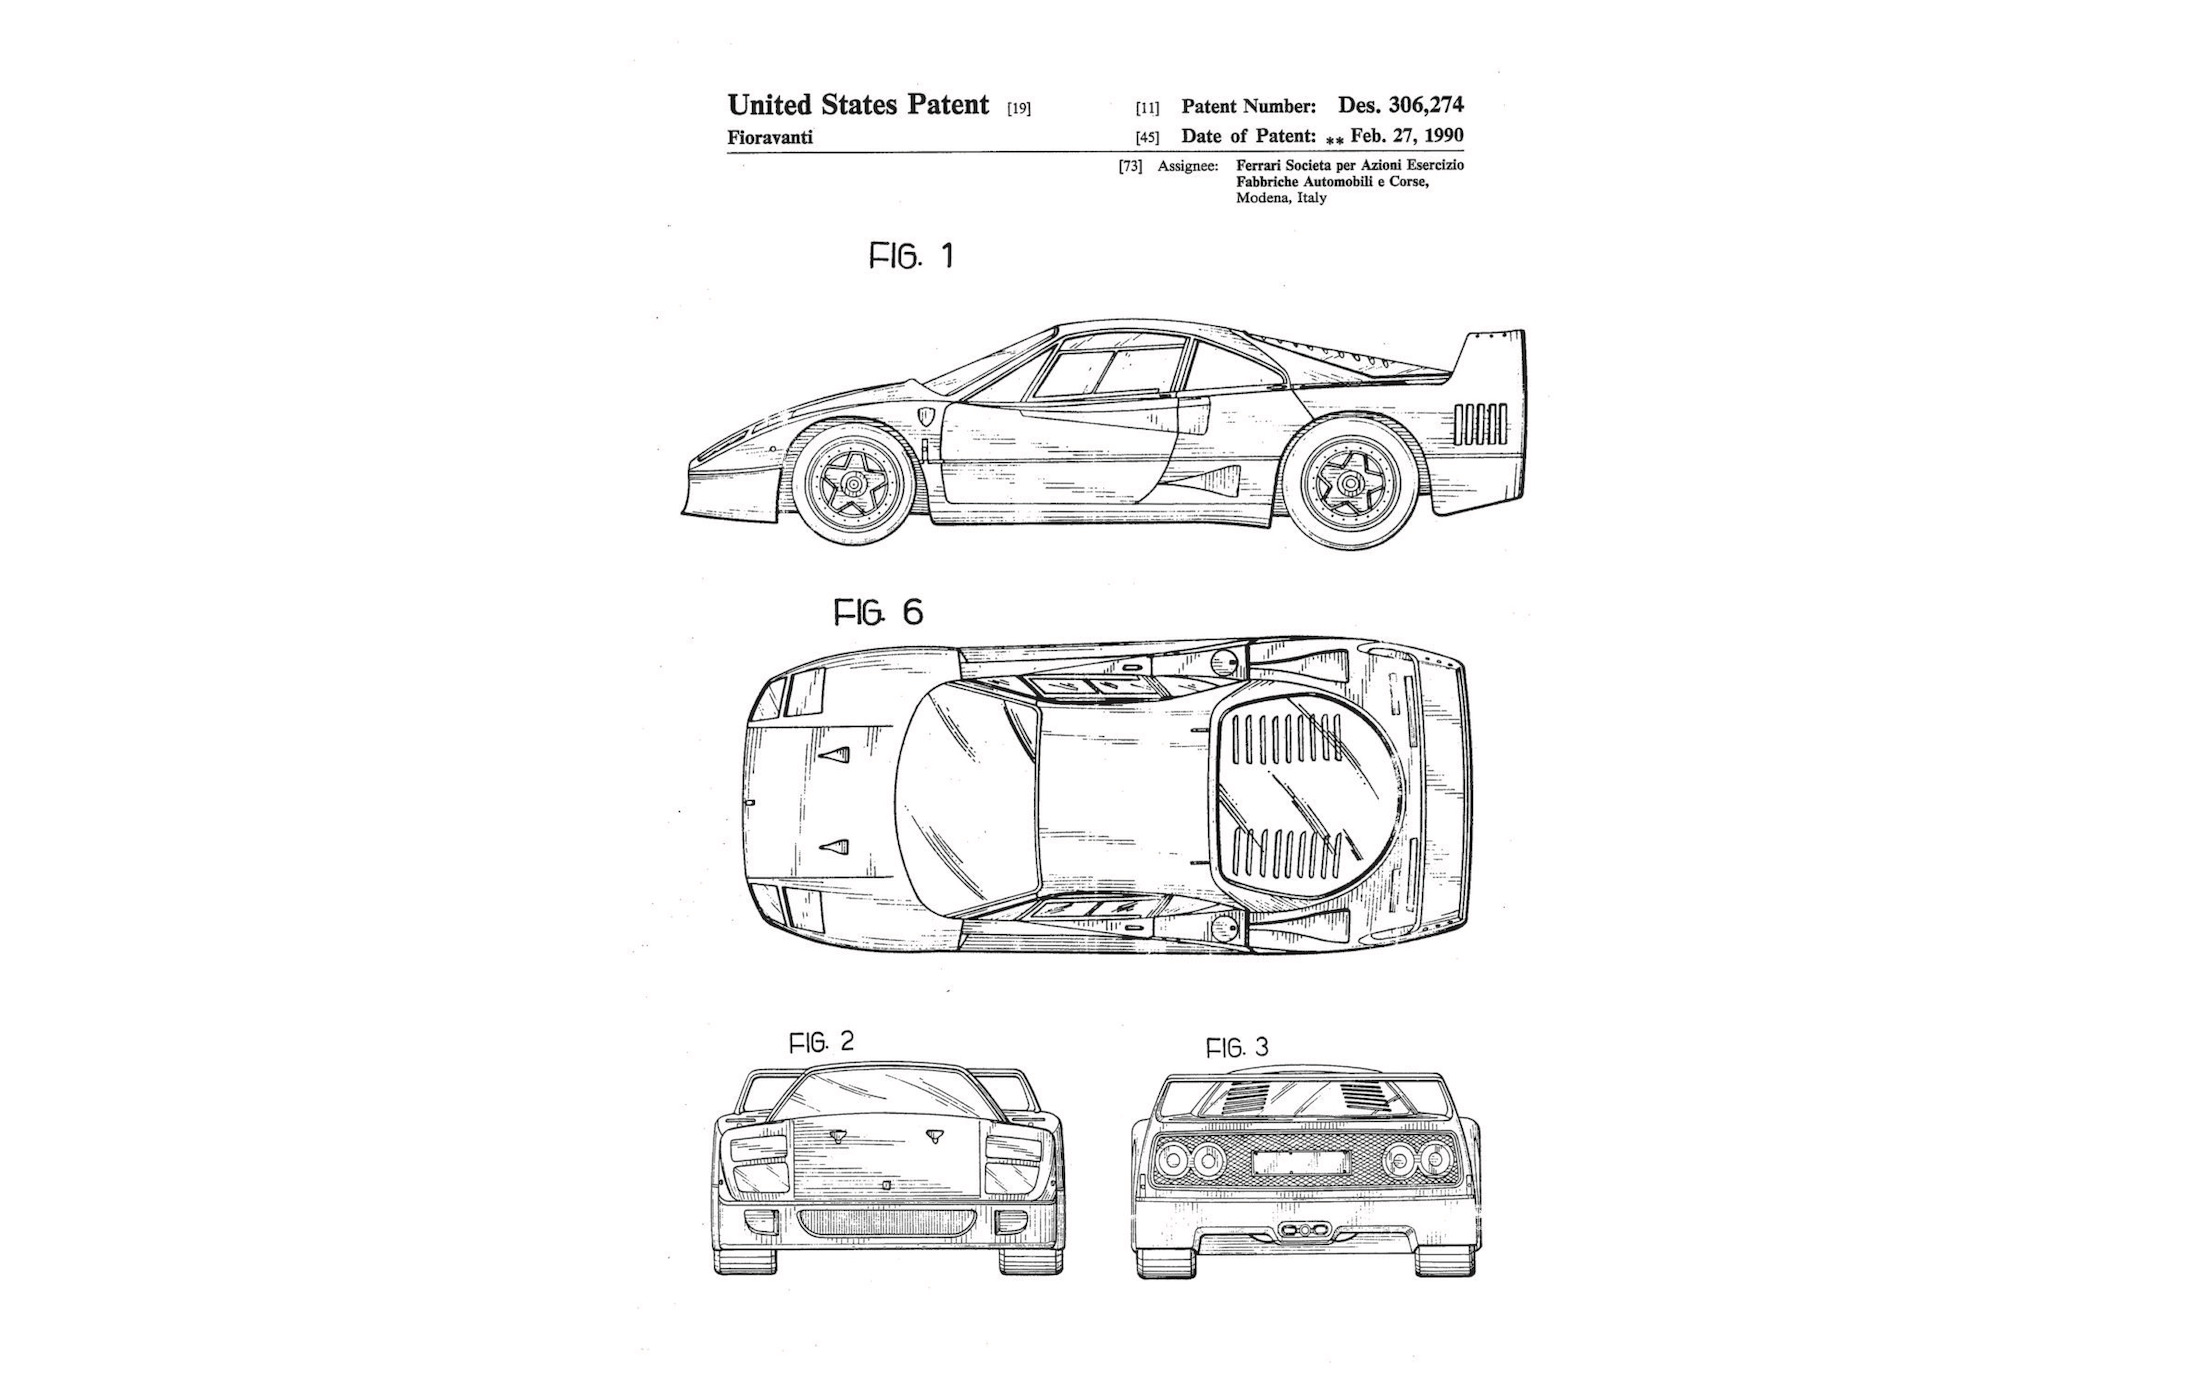 The Original Ferrari F40 Patent Drawings